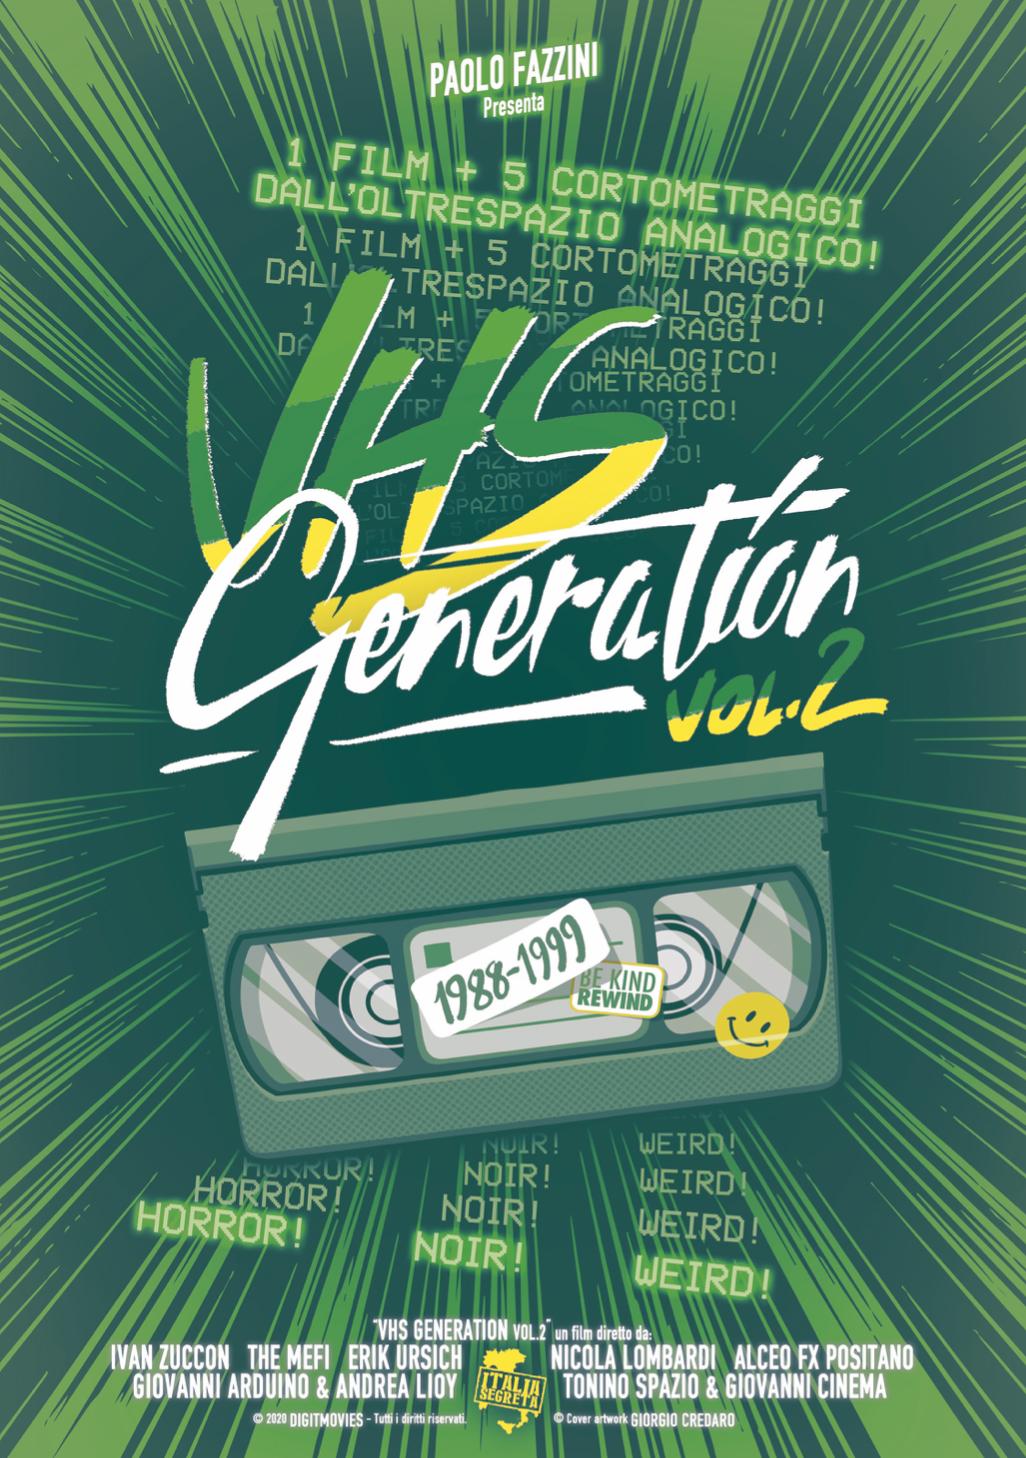 VHS GENERATION VOL. 2 (DVD)